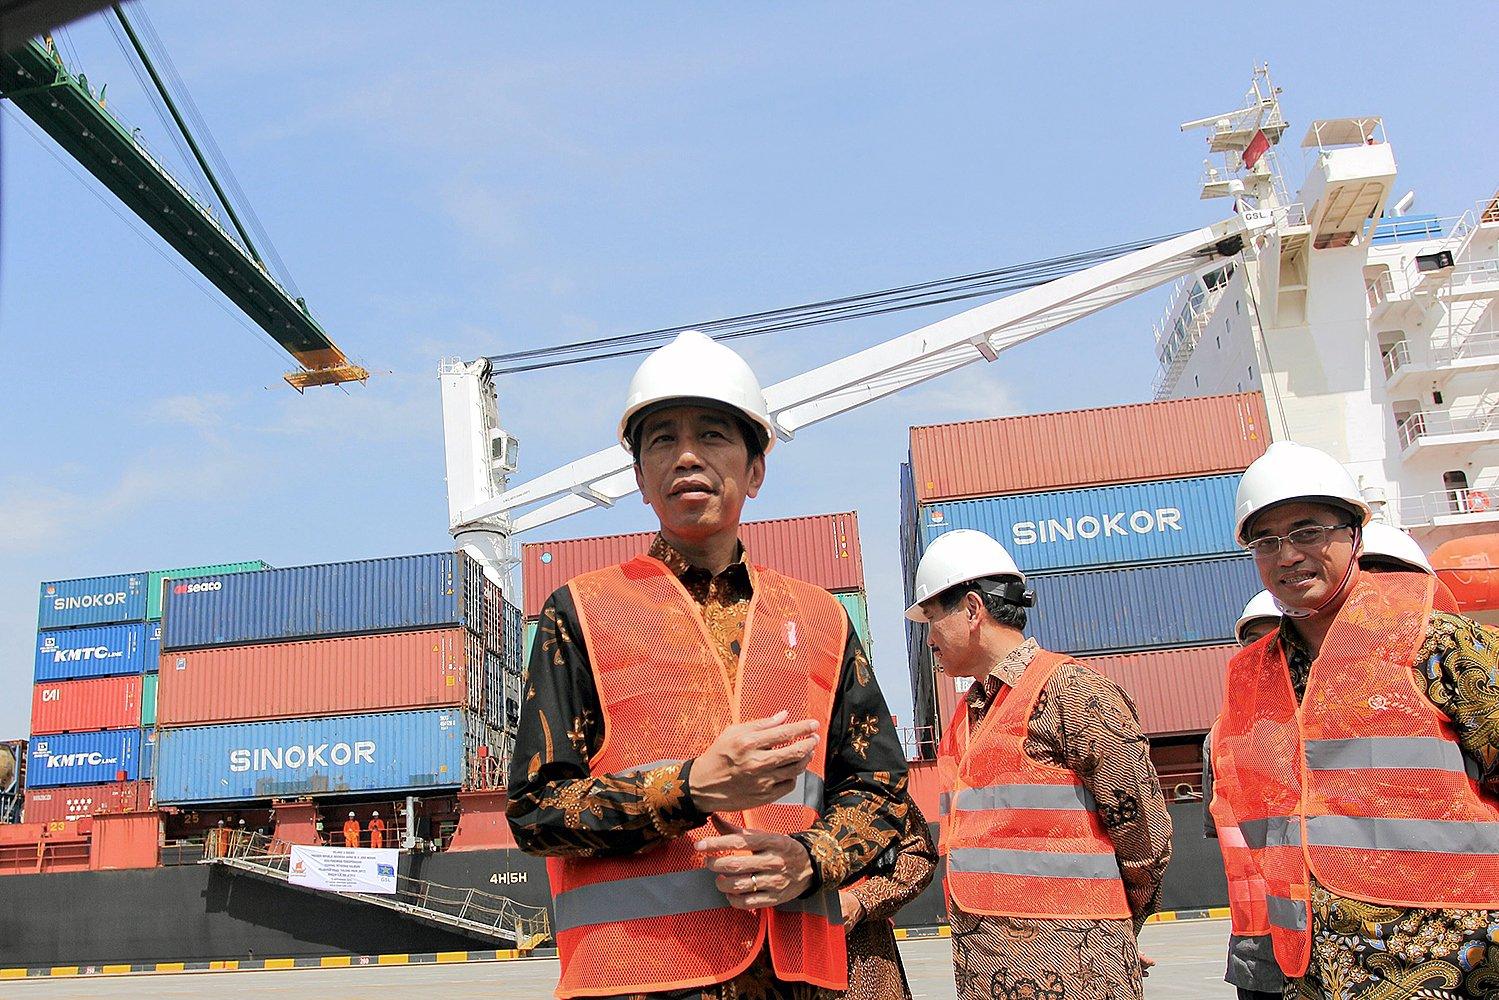 Presiden Joko Widodo didampingi Menko Maritim Luhut Binsar Panjaitan dan Dirut Pelindo II Elvyn G. Masassya meninjau pengoperasioan Terminal Petikemas Kalibaru Pelabuhan Utama Tanjung Priok di Jakarta, Selasa (13/9).